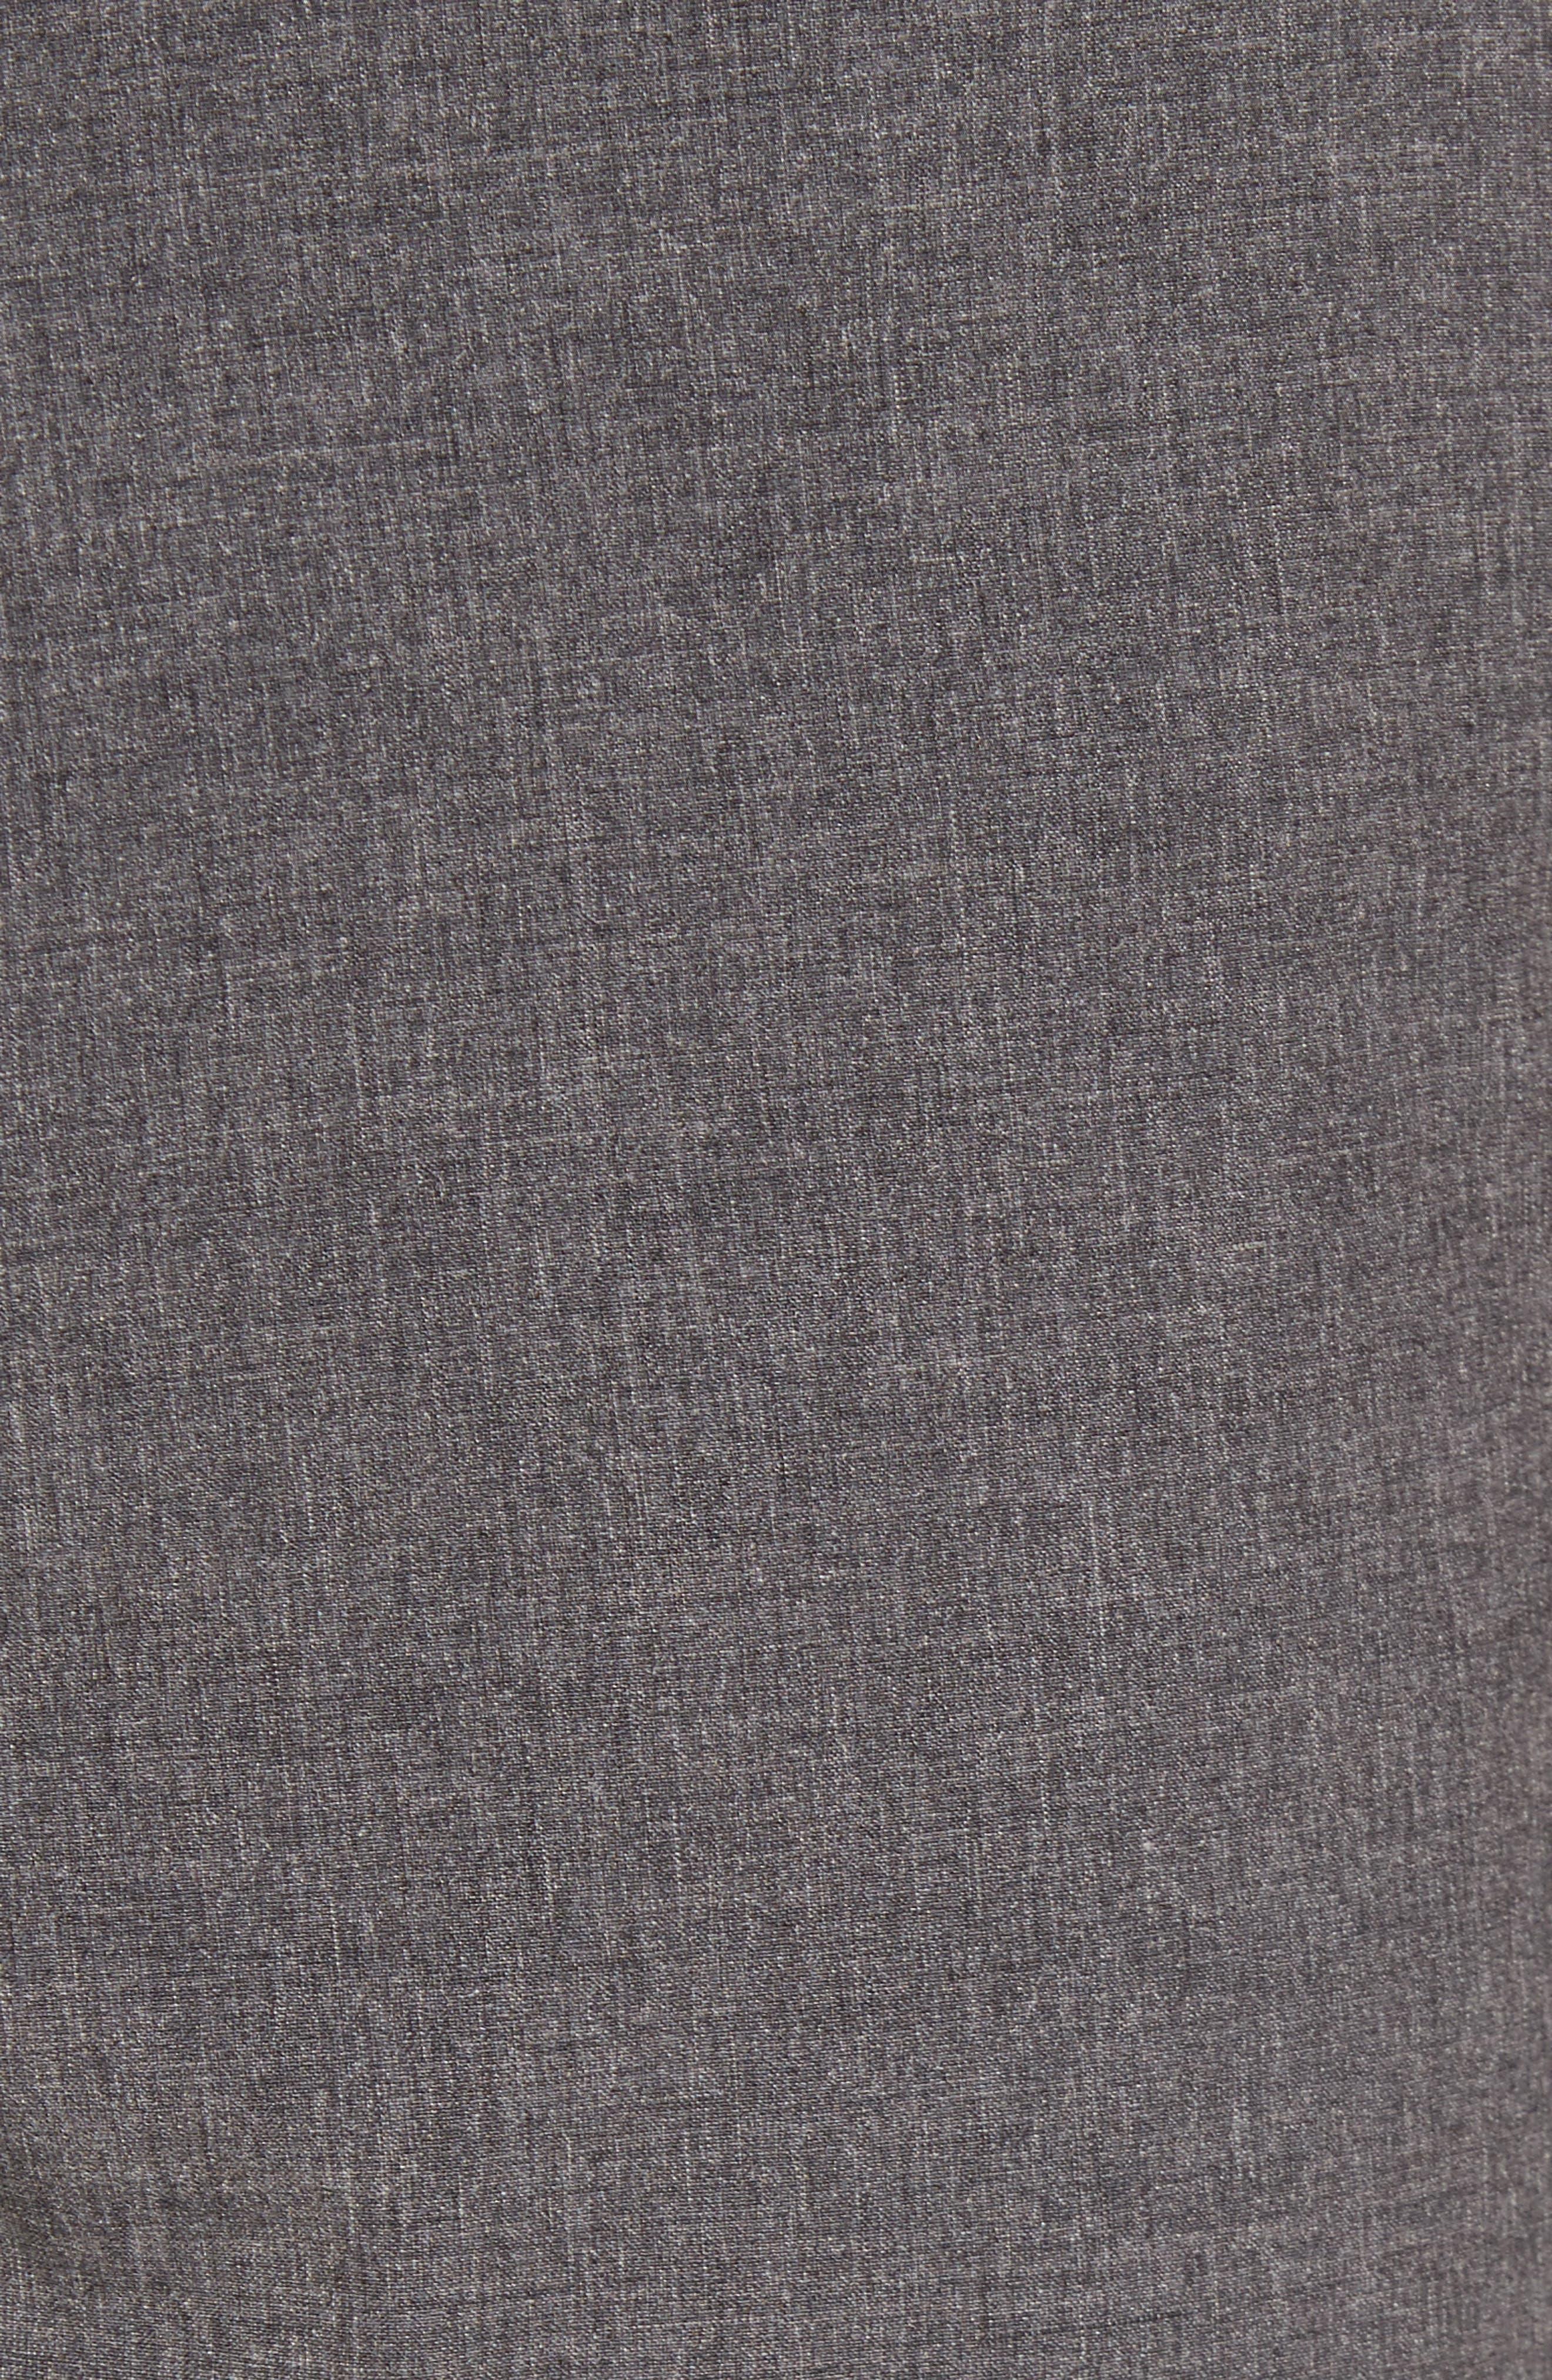 Hybrid Shorts,                             Alternate thumbnail 5, color,                             CHARCOAL